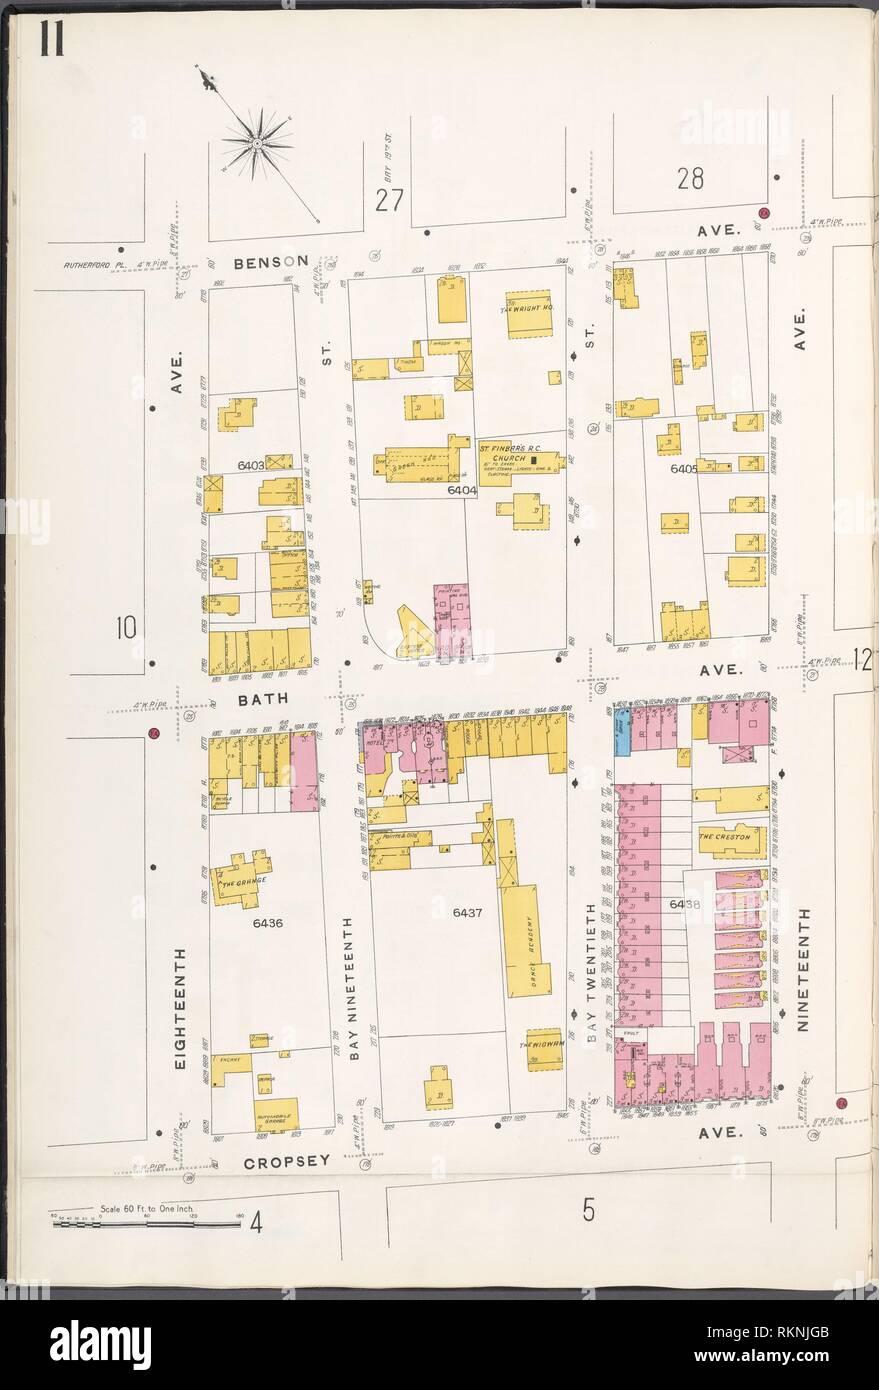 Brooklyn V. 12, Teller Nr. 11 [ Karte von Benson Ave., 19. Ave., cropsey Ave., 18. Ave.]. Sanborn Map Company (Publisher). Atlanten von New York Stockfoto